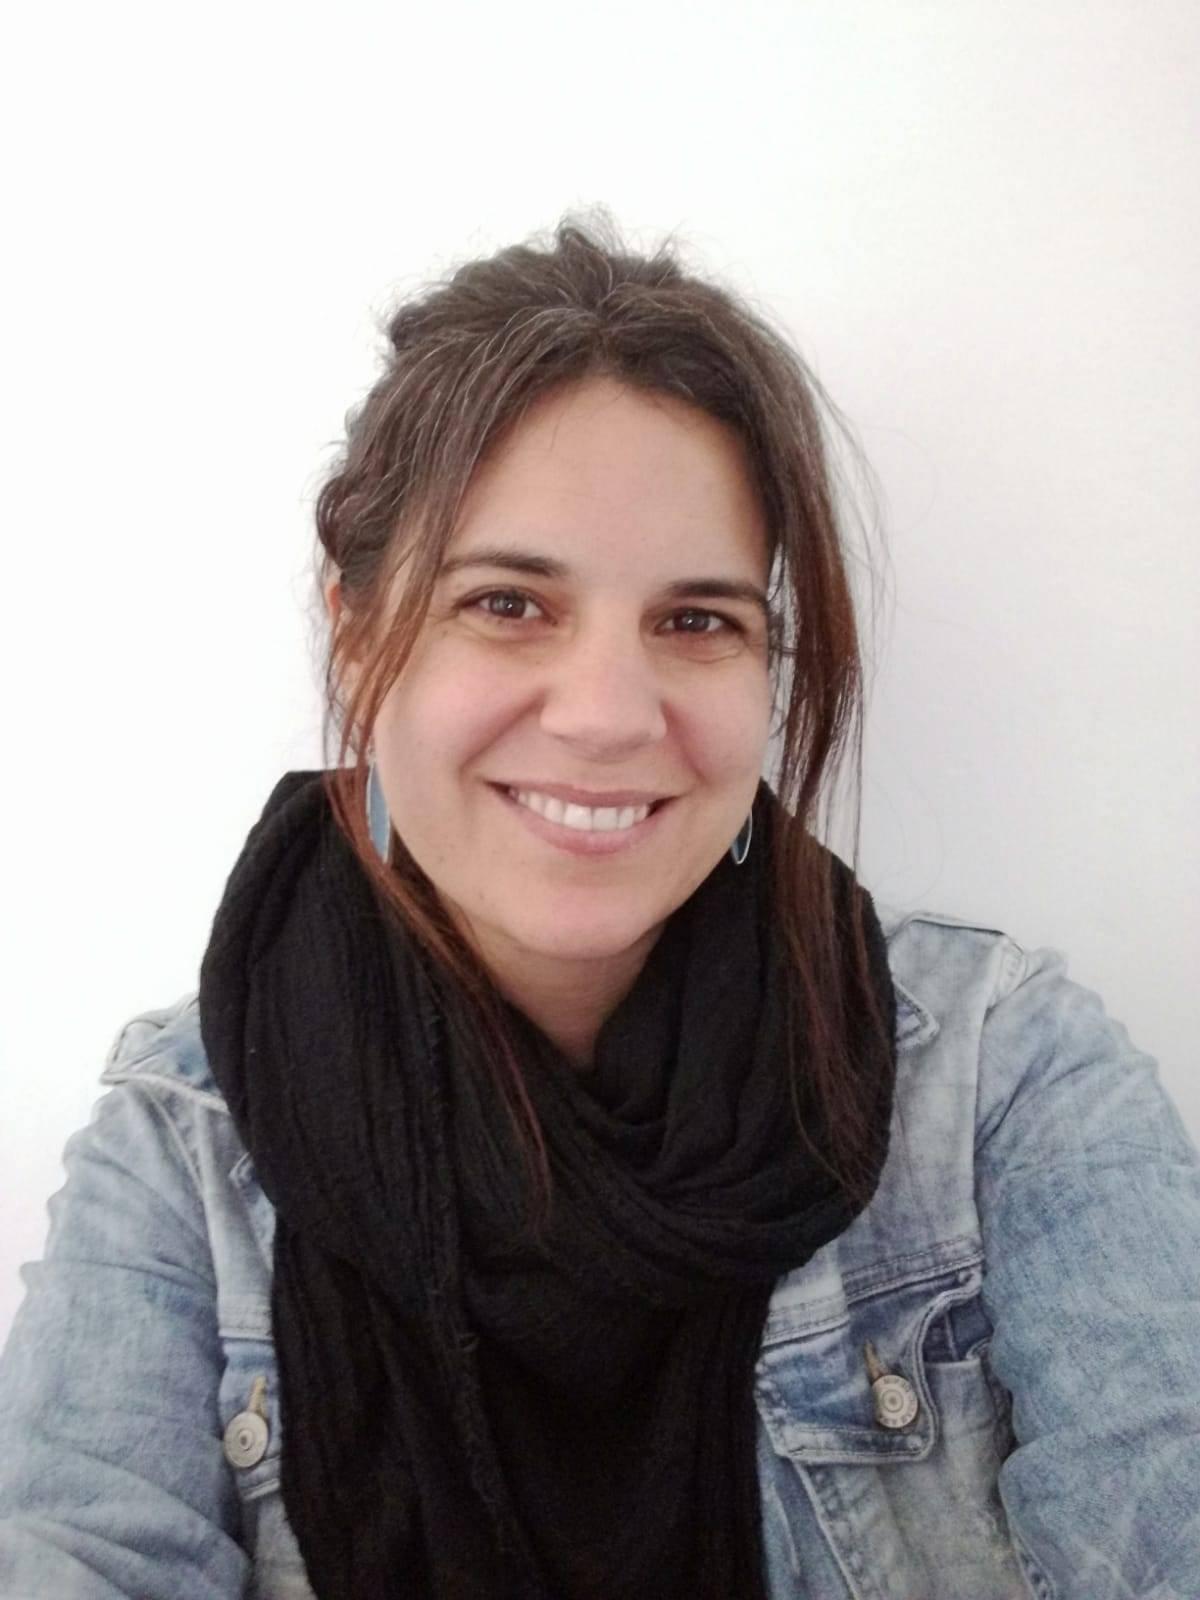 Madre y opositora: Arantxa